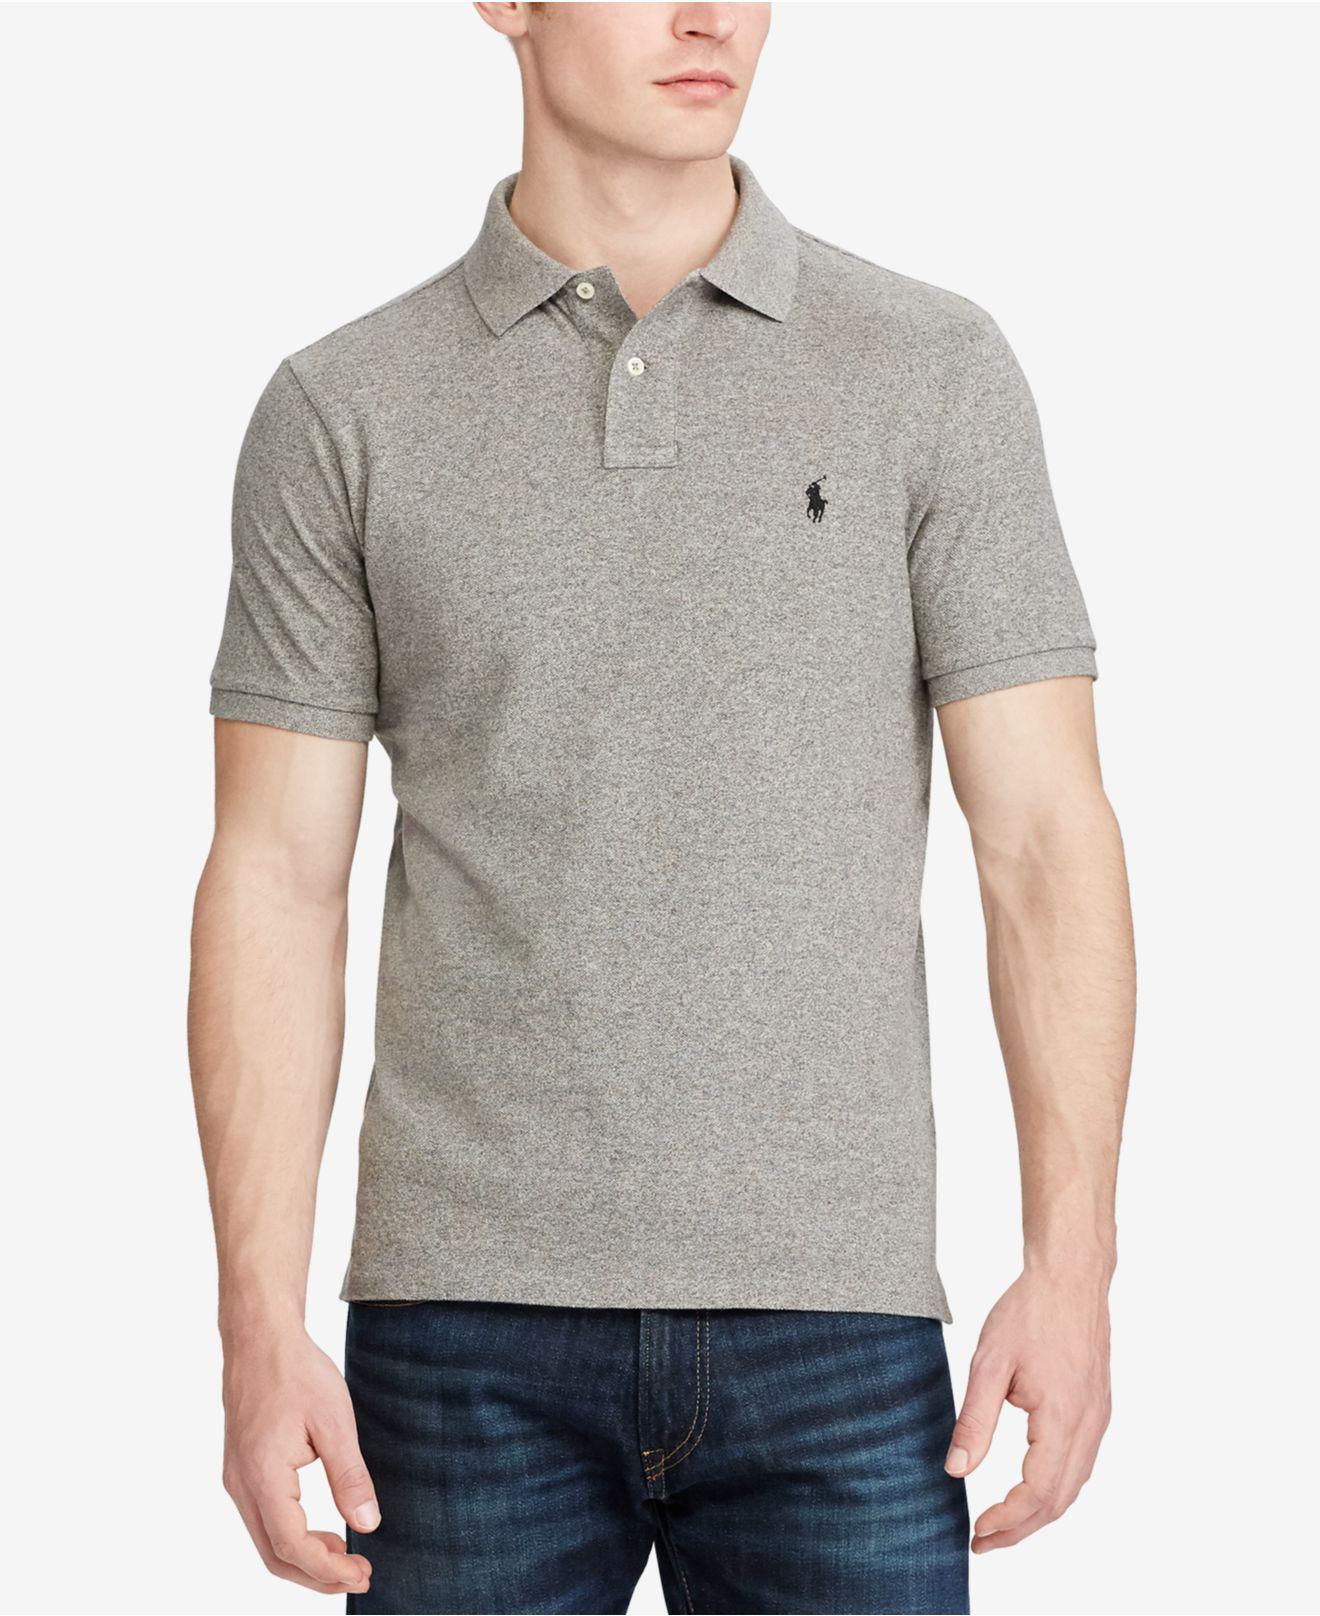 1abc84c3fd65 Lyst - Polo Ralph Lauren Custom Slim-fit Mesh Polo Shirt in Gray for Men